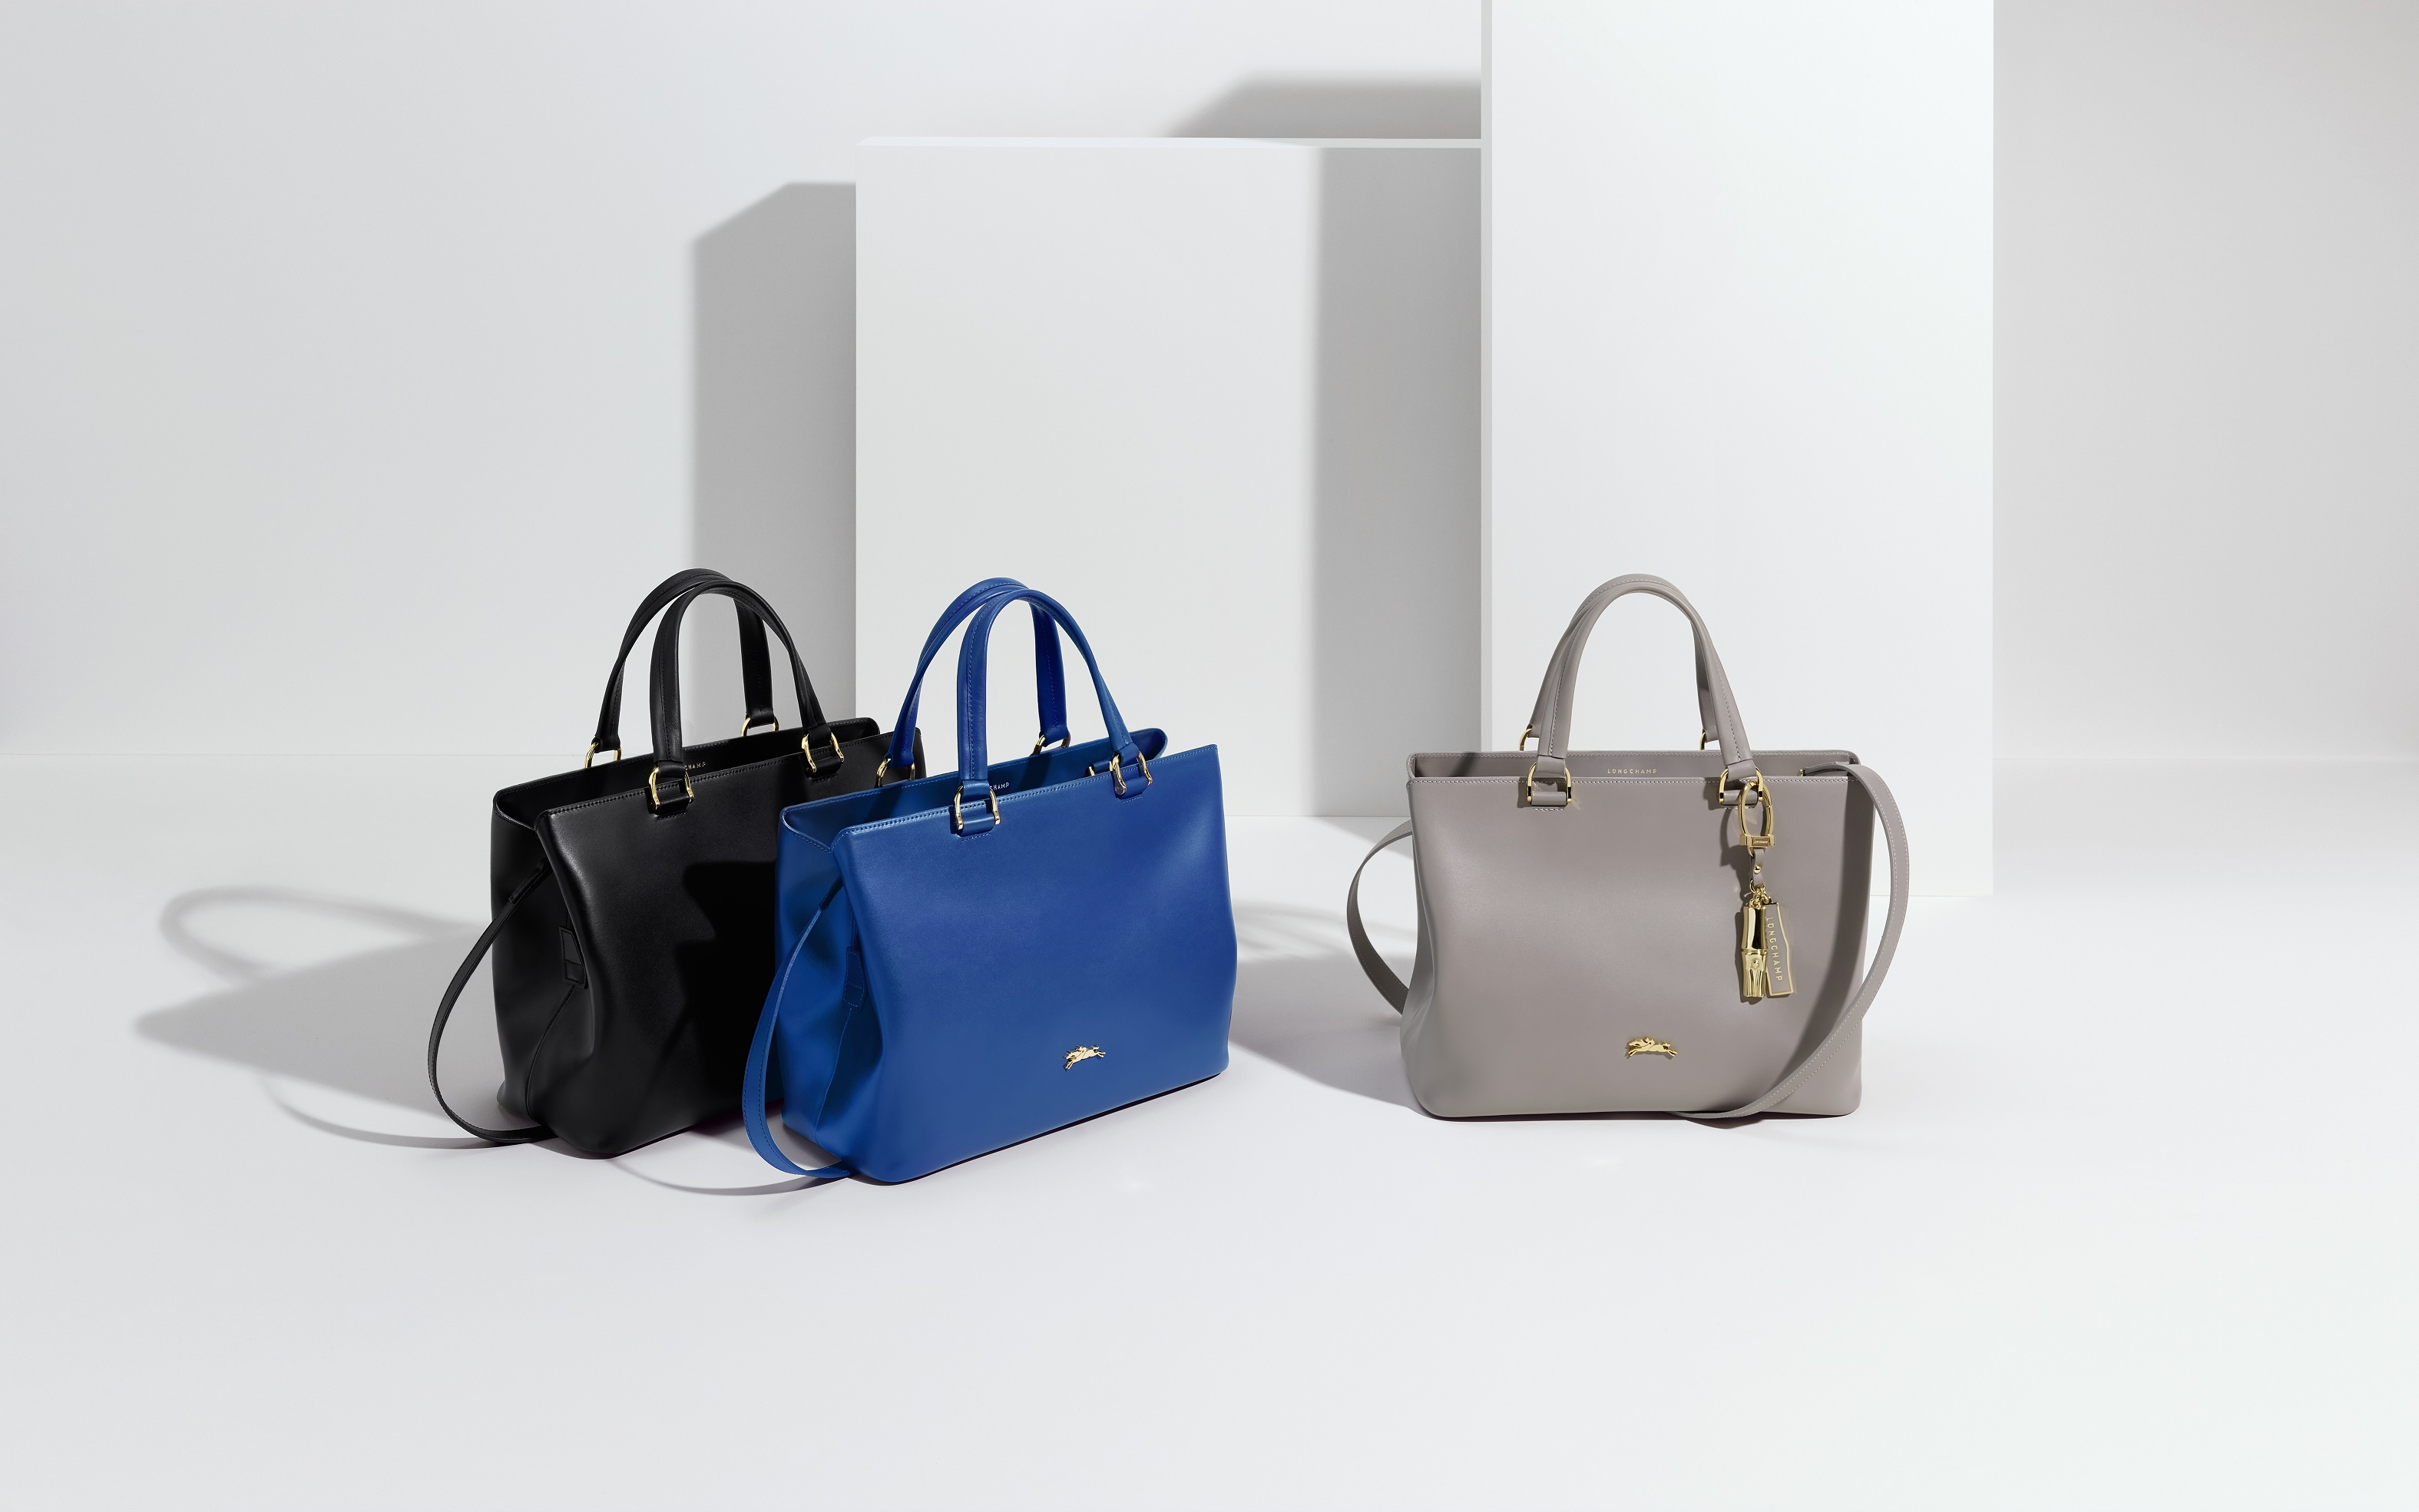 5. Longchamp Honoré 404 (經典黑、電光藍、褐灰色) NT22,700(大)、NT20,600(小)、金色竹節掛飾NT3,400